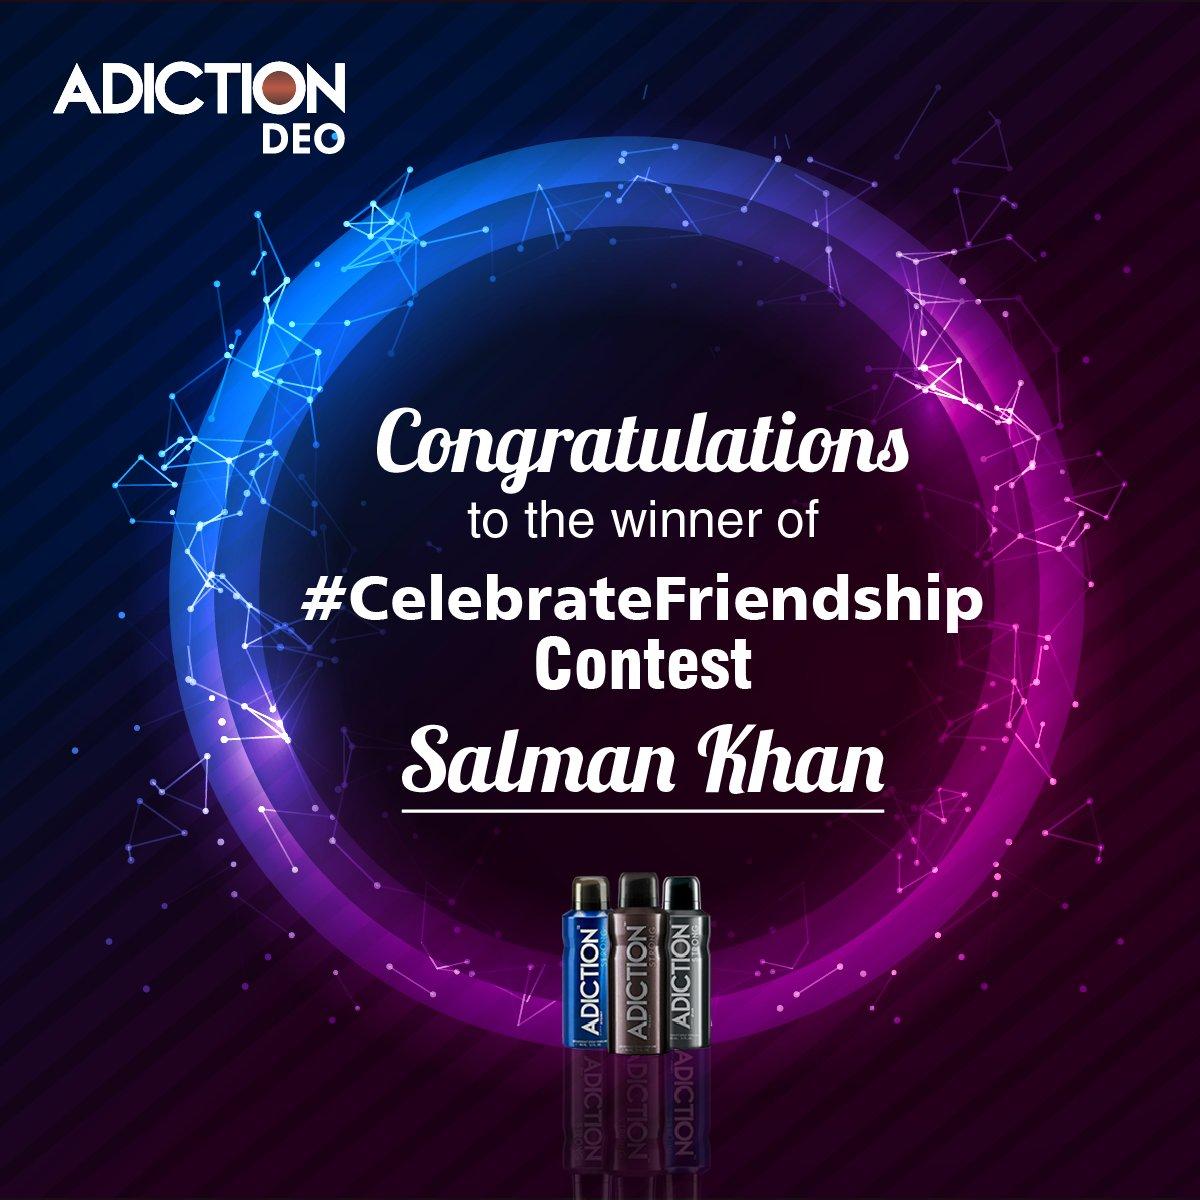 Congratulations to 'Salman Khan(@sayan989)' winner of #CelebrateFriendship Contest. #ContestWinner #SmellStrong #LastLong https://t.co/RqCaM4zwrv